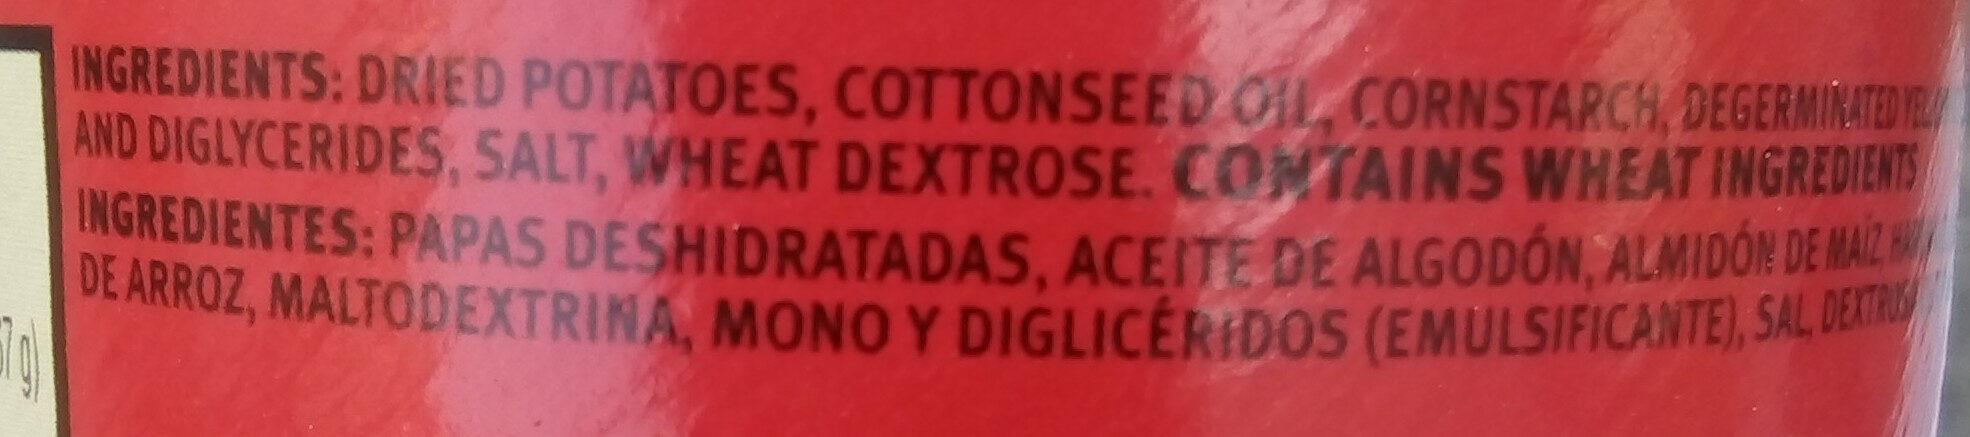 Potato crisps - Ingredientes - es